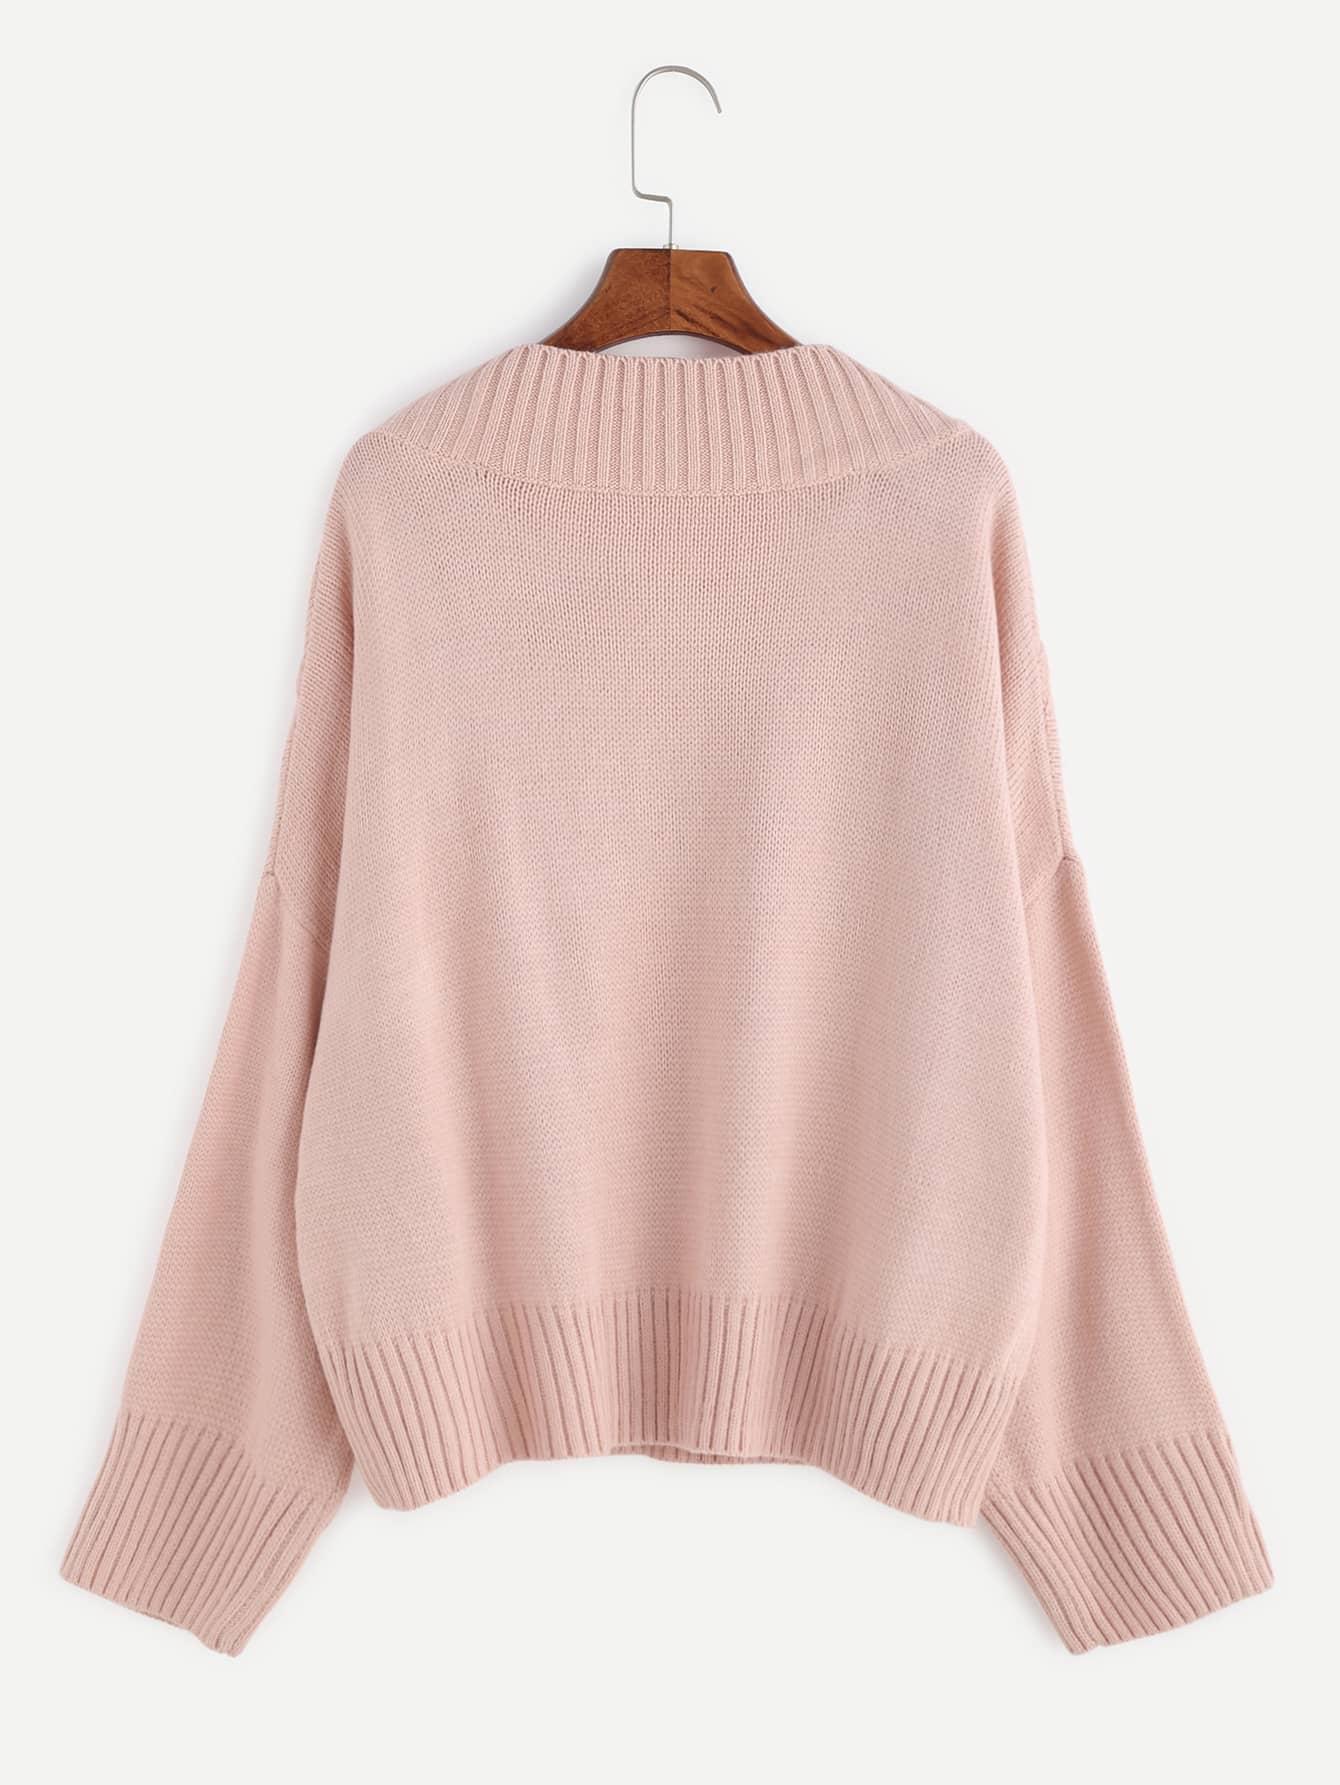 sweater161025003_2